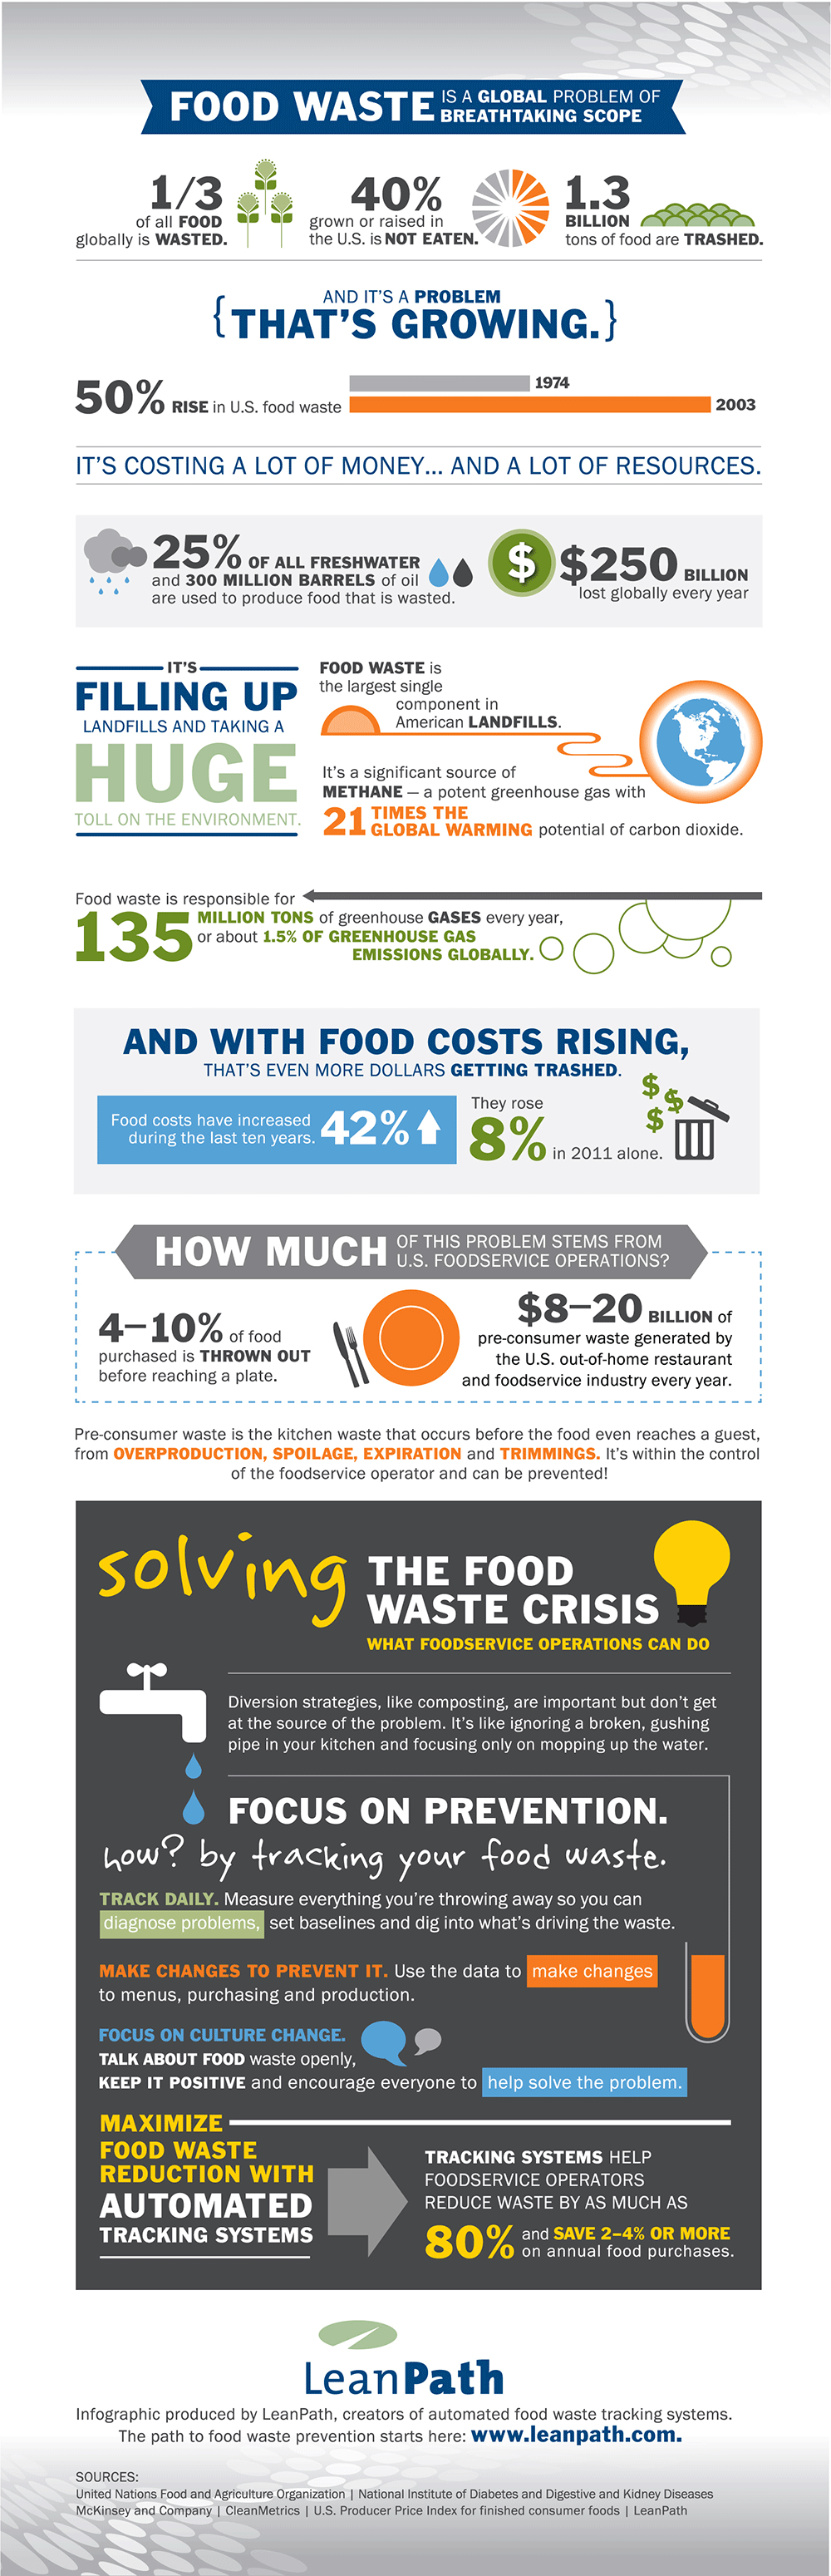 LeanPath food waste statistics infographic